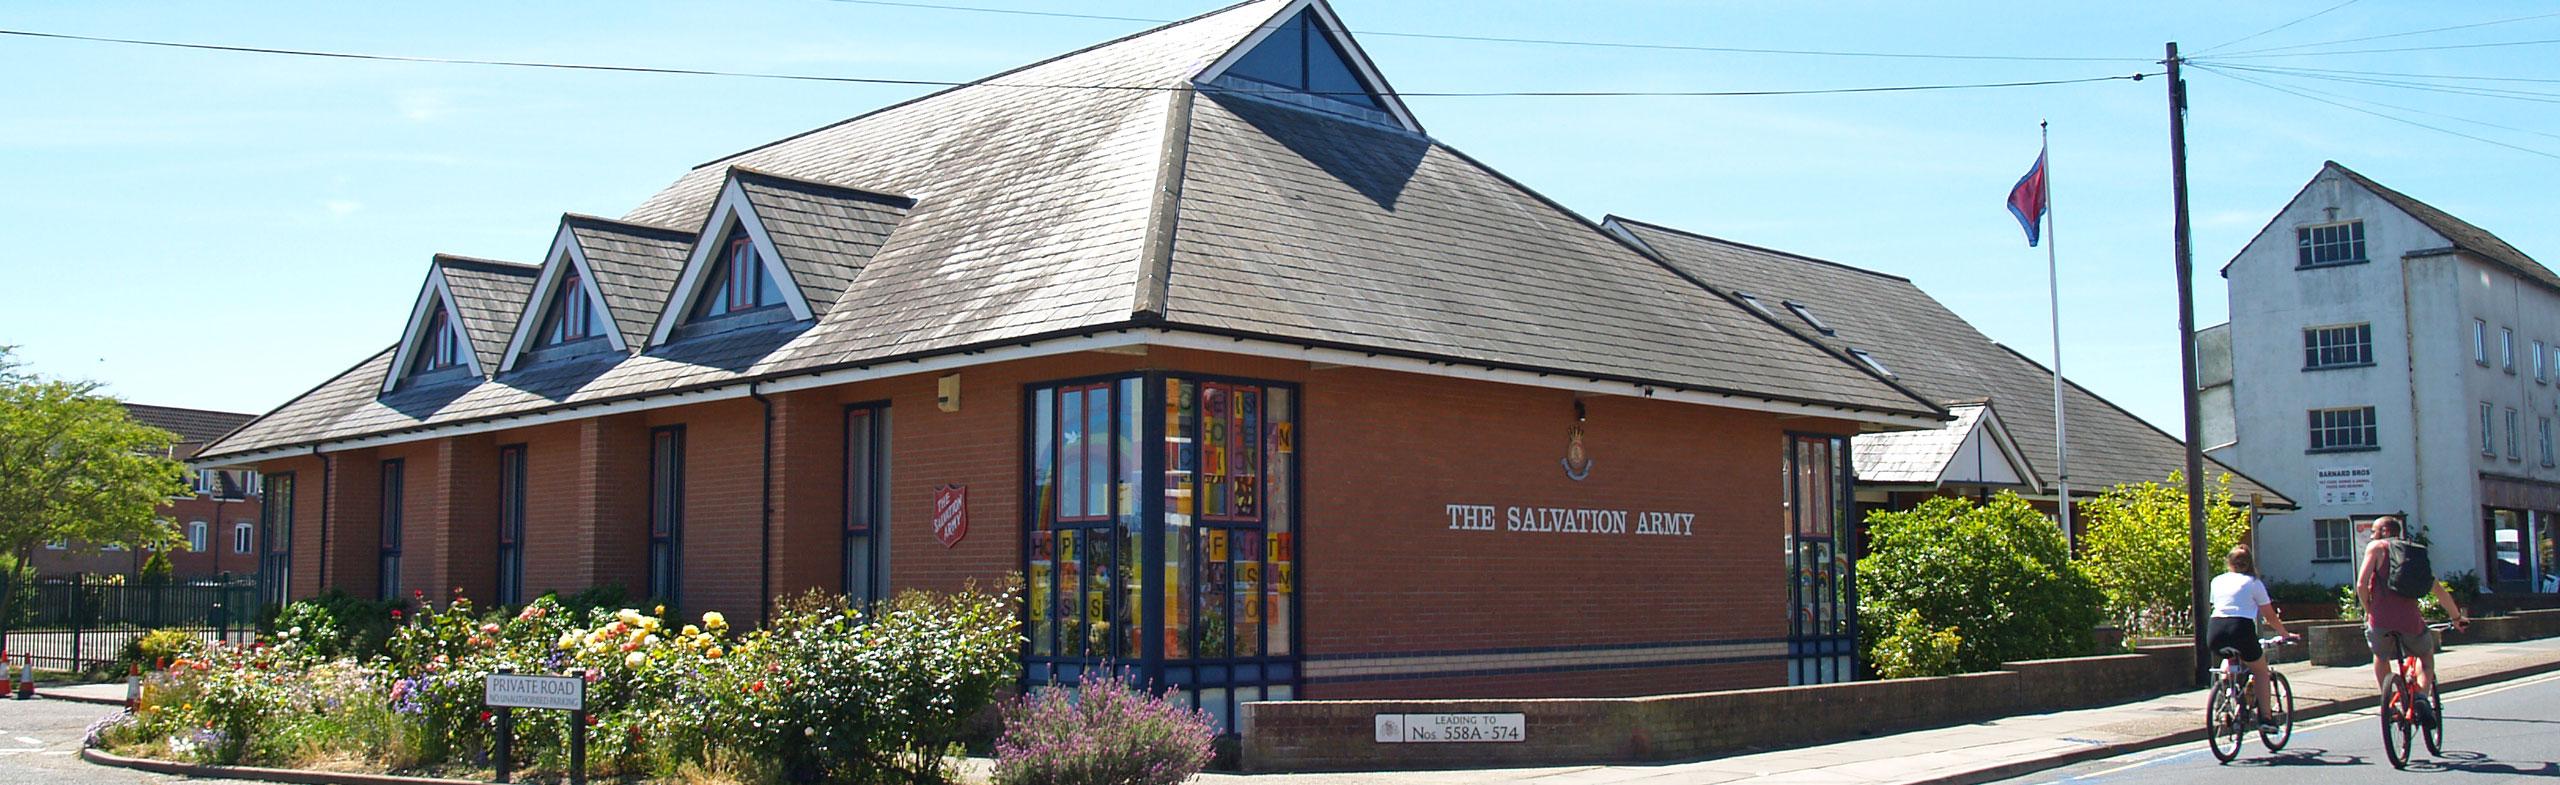 The Salvation Army - Ipswich Citadel